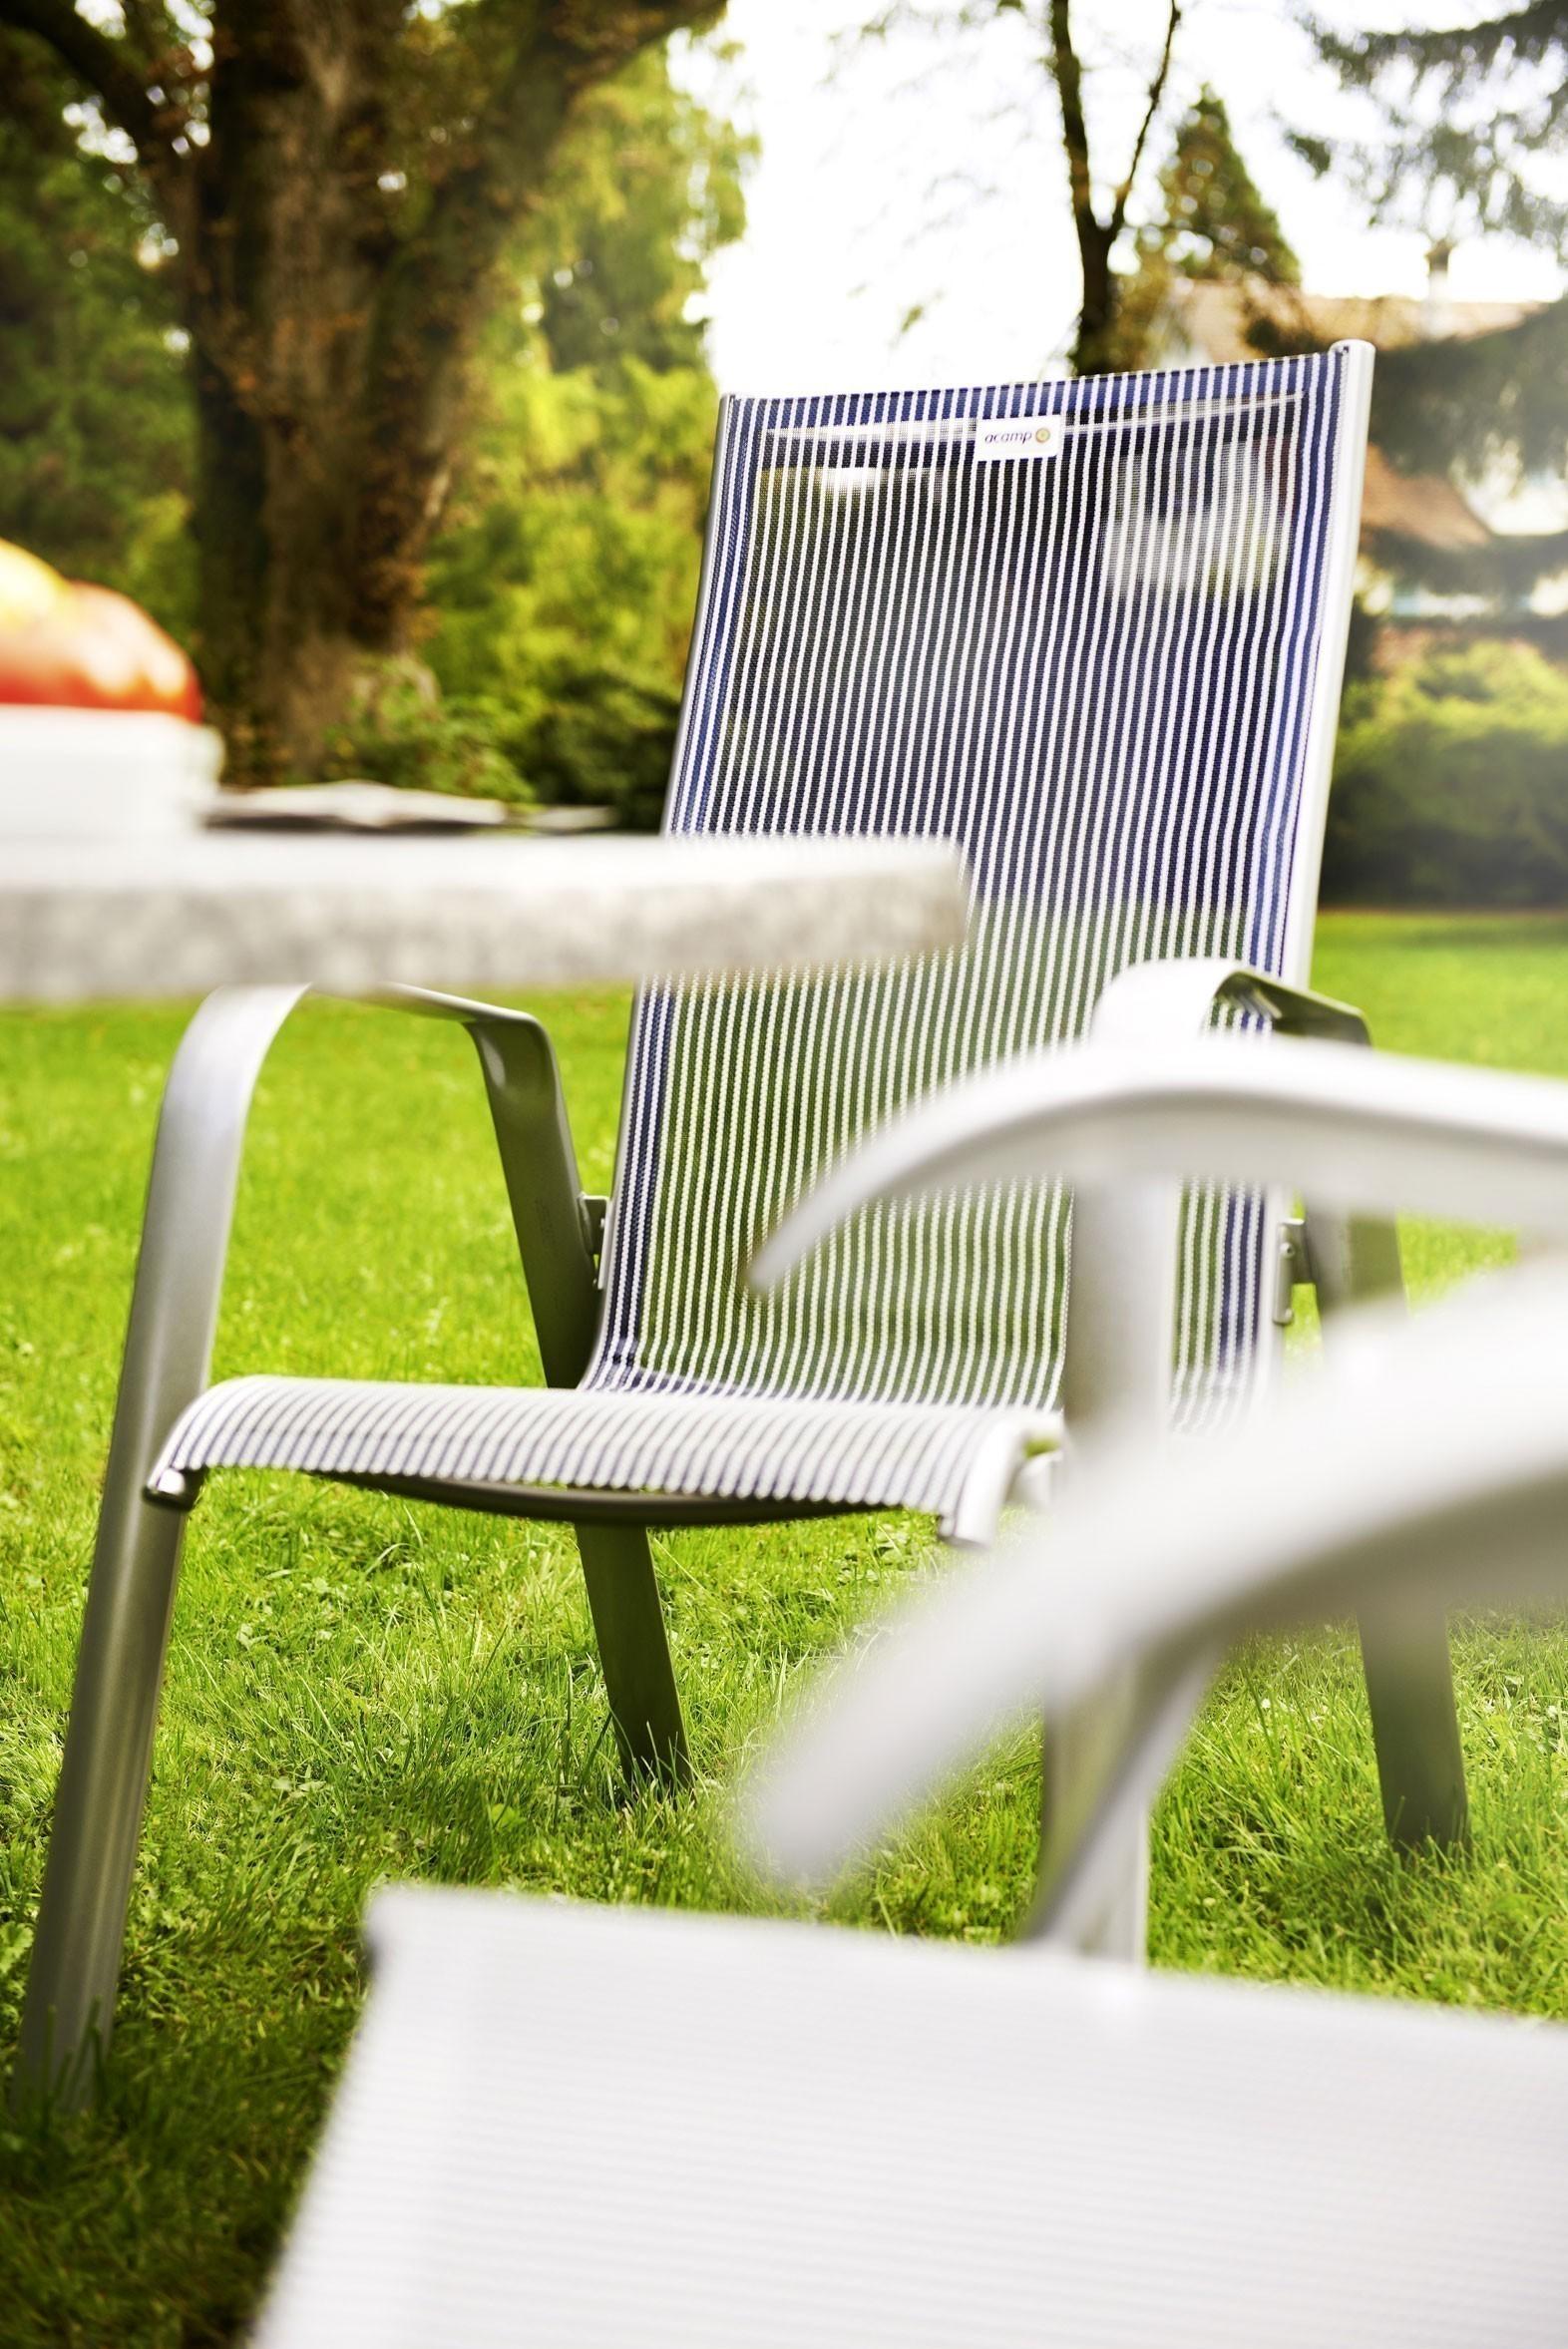 Gartensessel stapelbar Acamp Acatop hoch Alu platin / grigio Bild 2